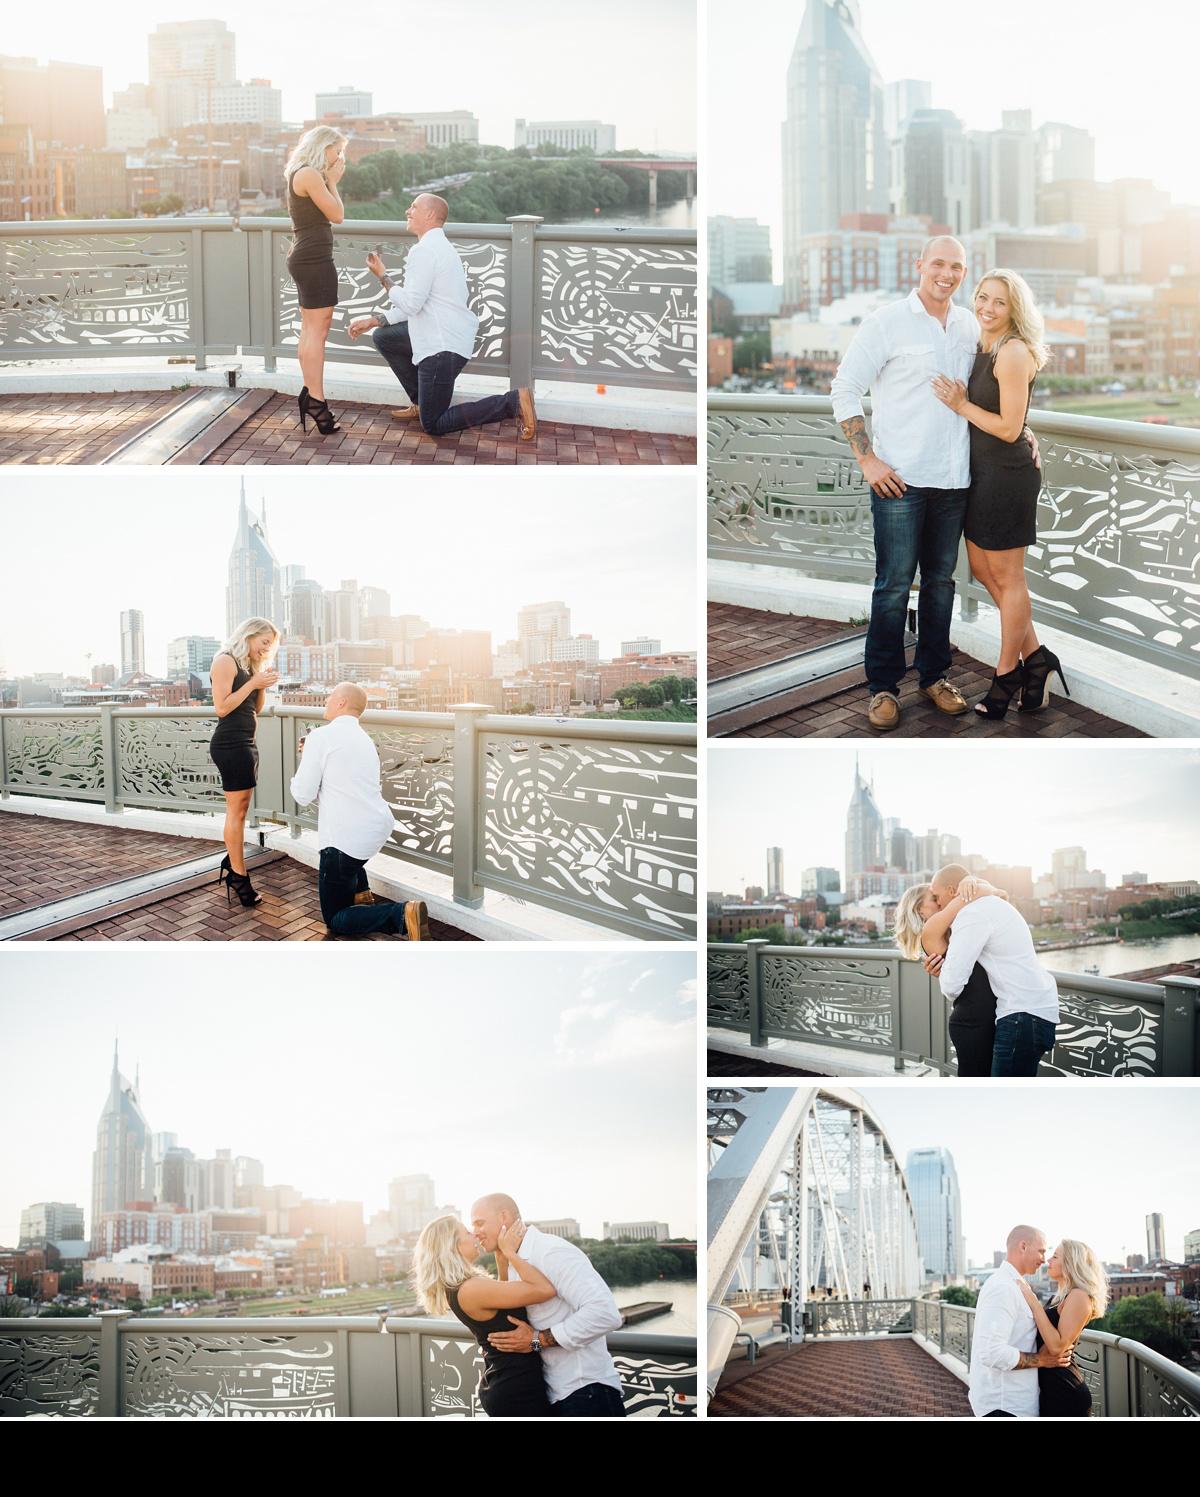 nashville-pedestrian-bridge-surpise-proposal-photographer Nashville Proposal Photographer